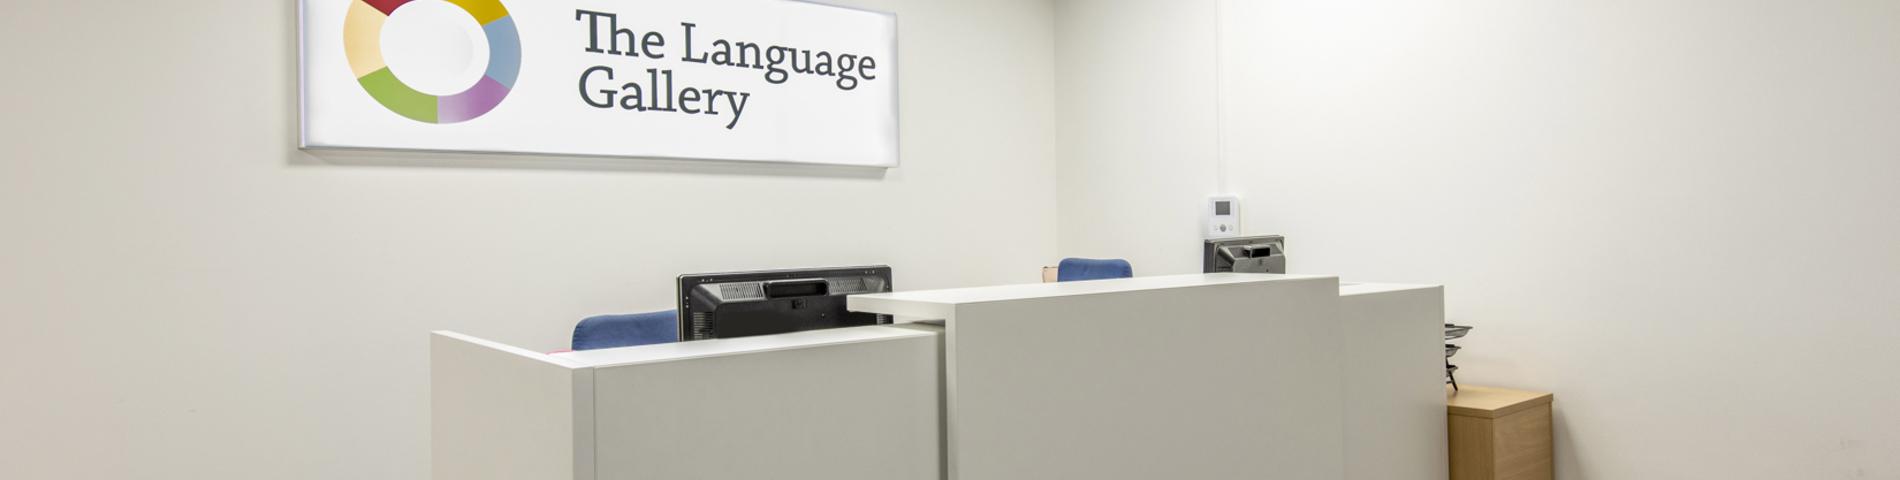 The Language Gallery صورة 1